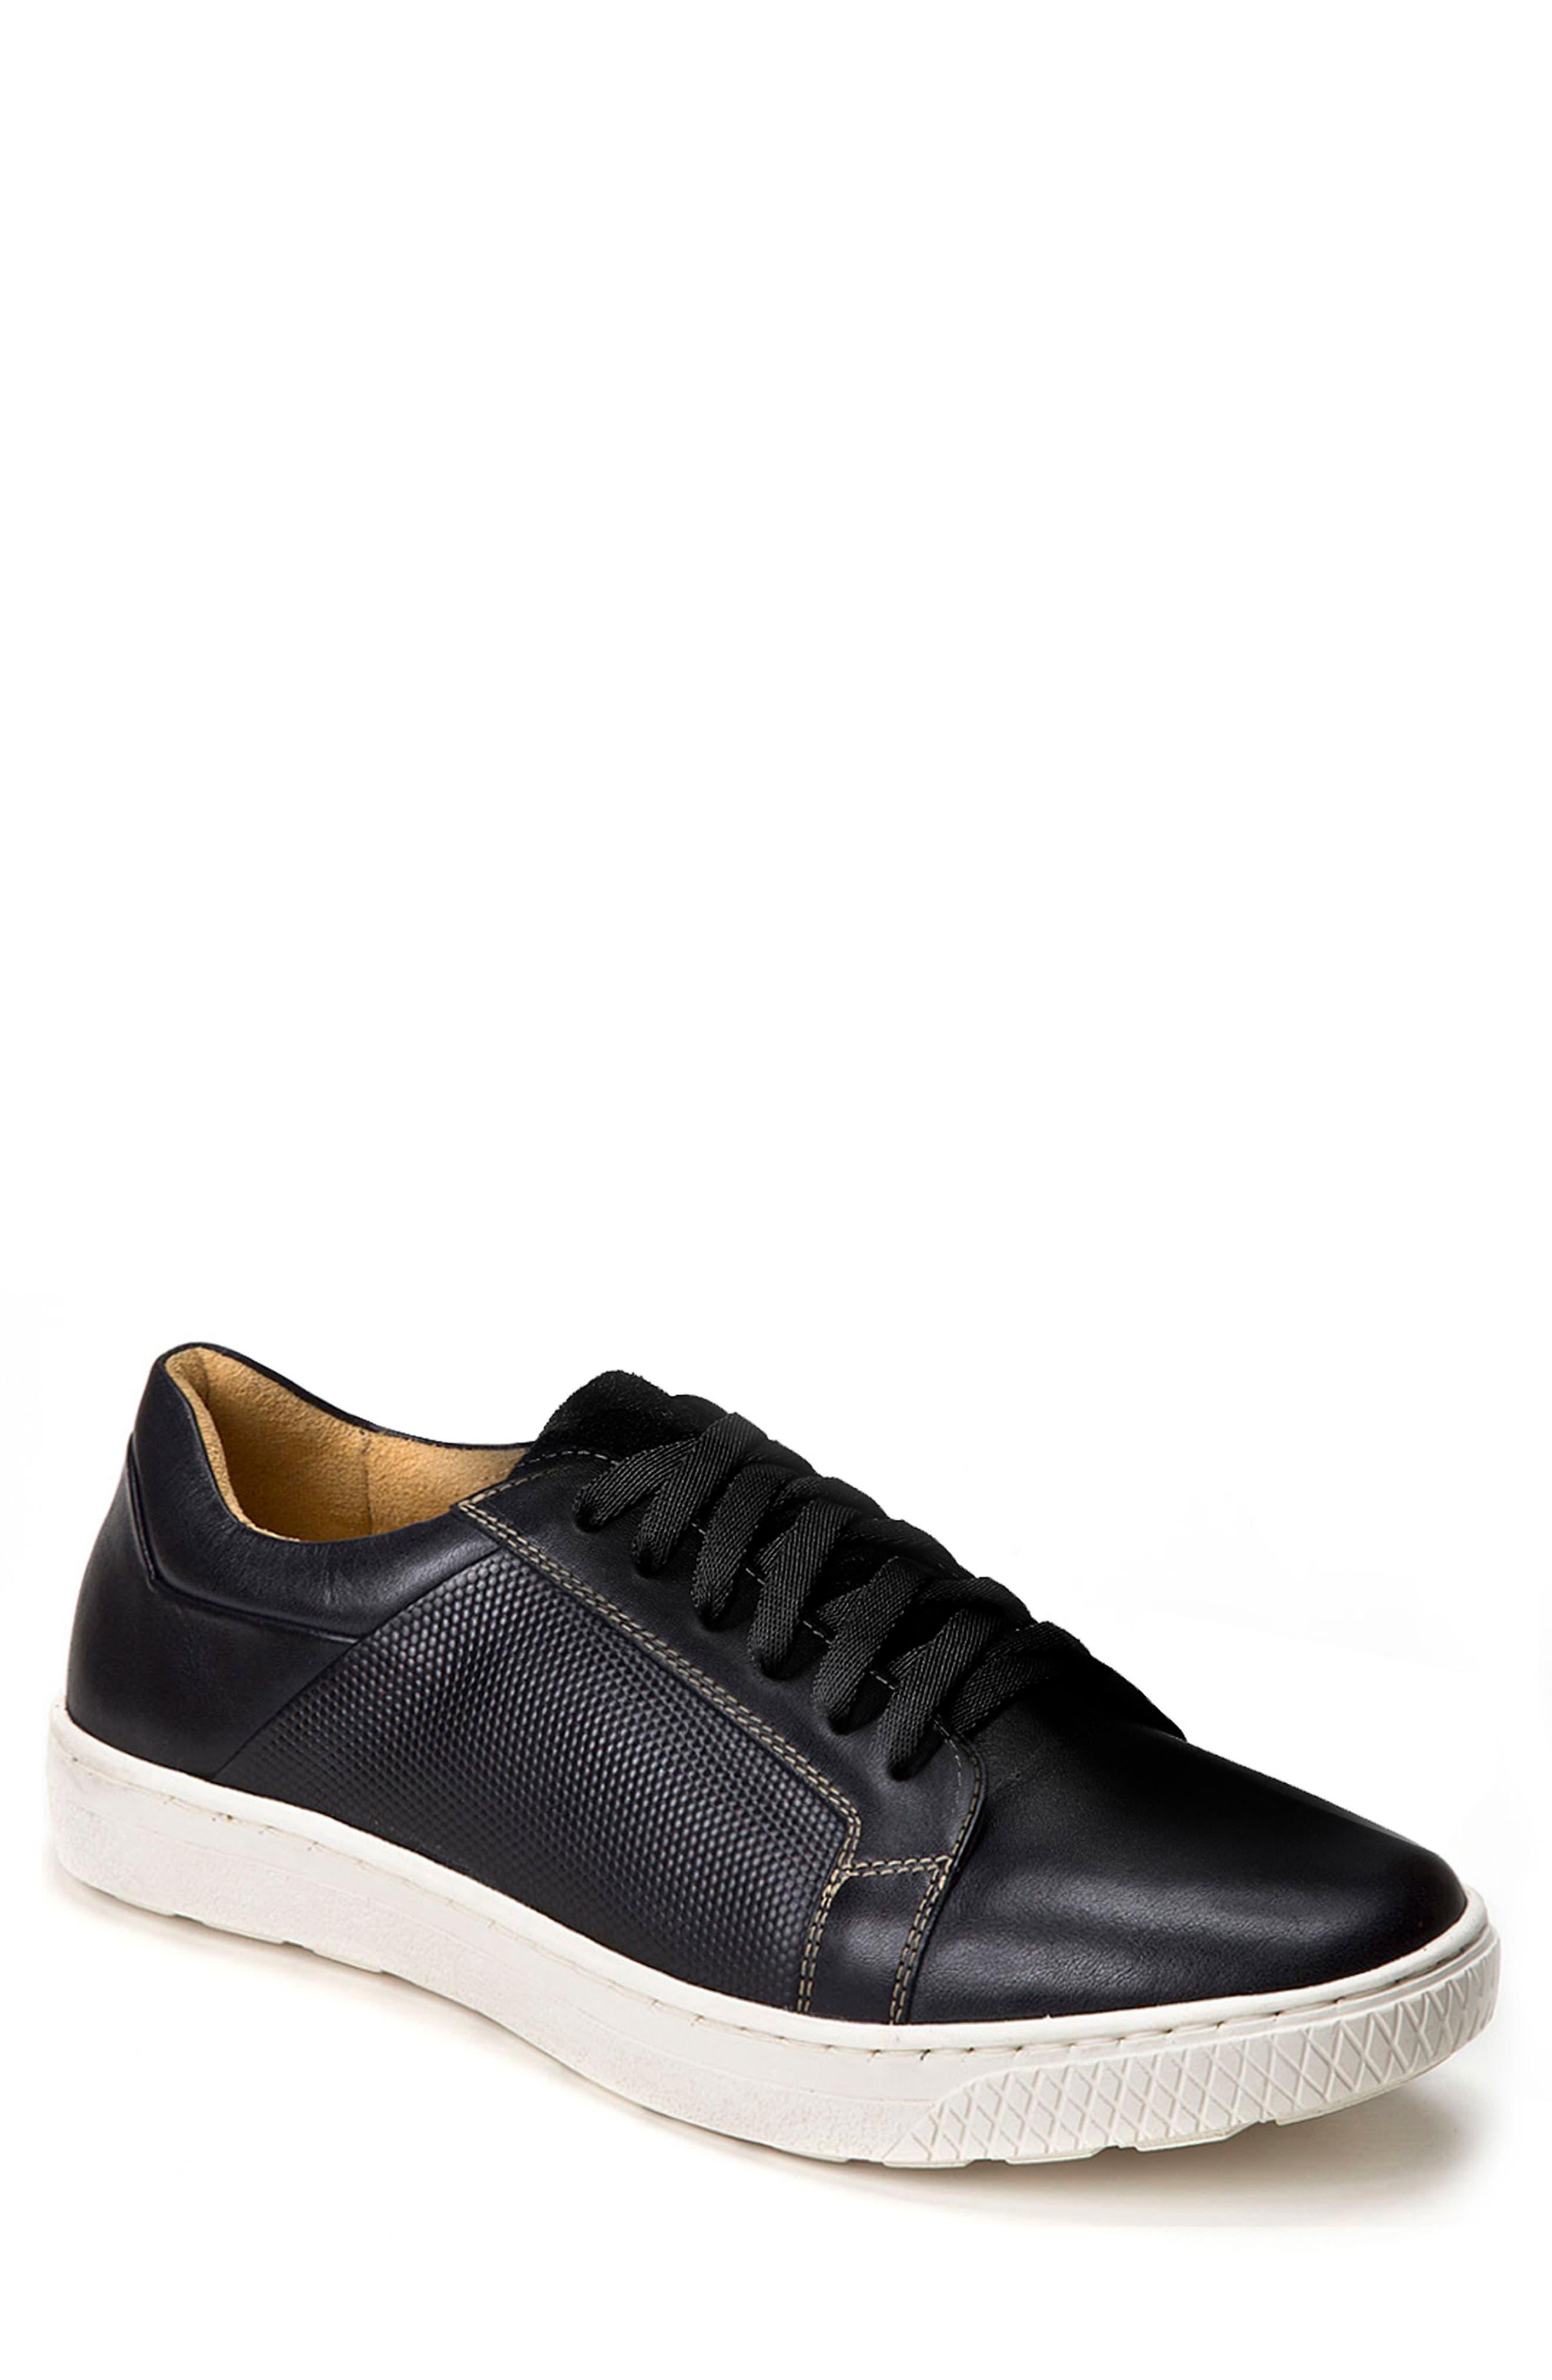 Sandro Moscoloni Nico Textured Sneaker, Black